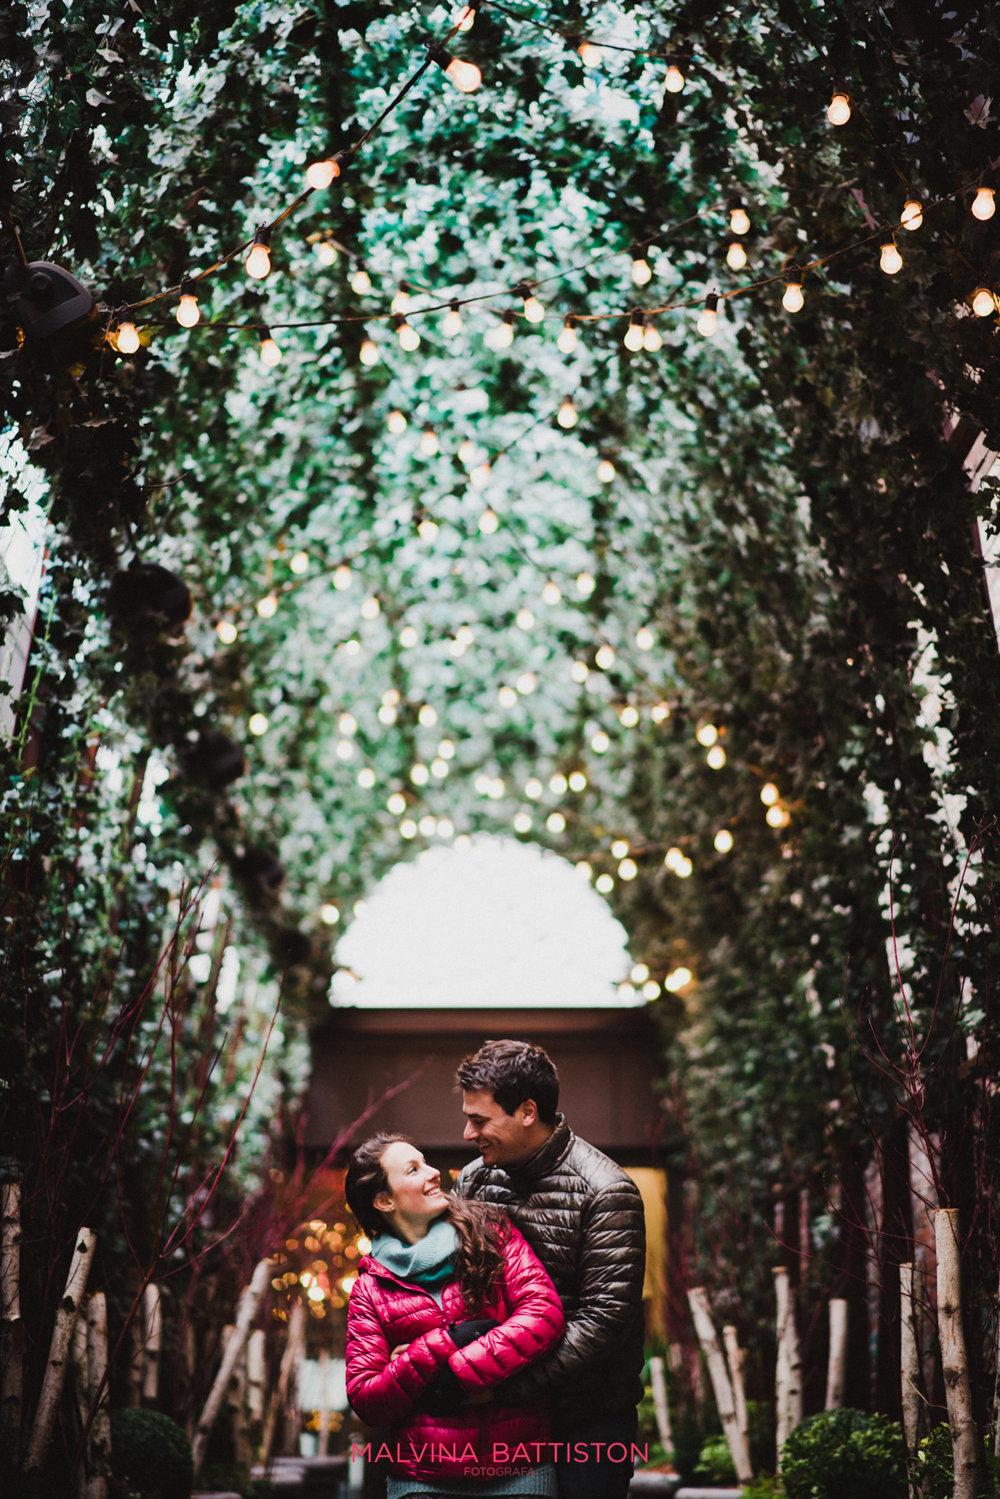 New York Wedding photography - Session Mati and Sisi 016.JPG